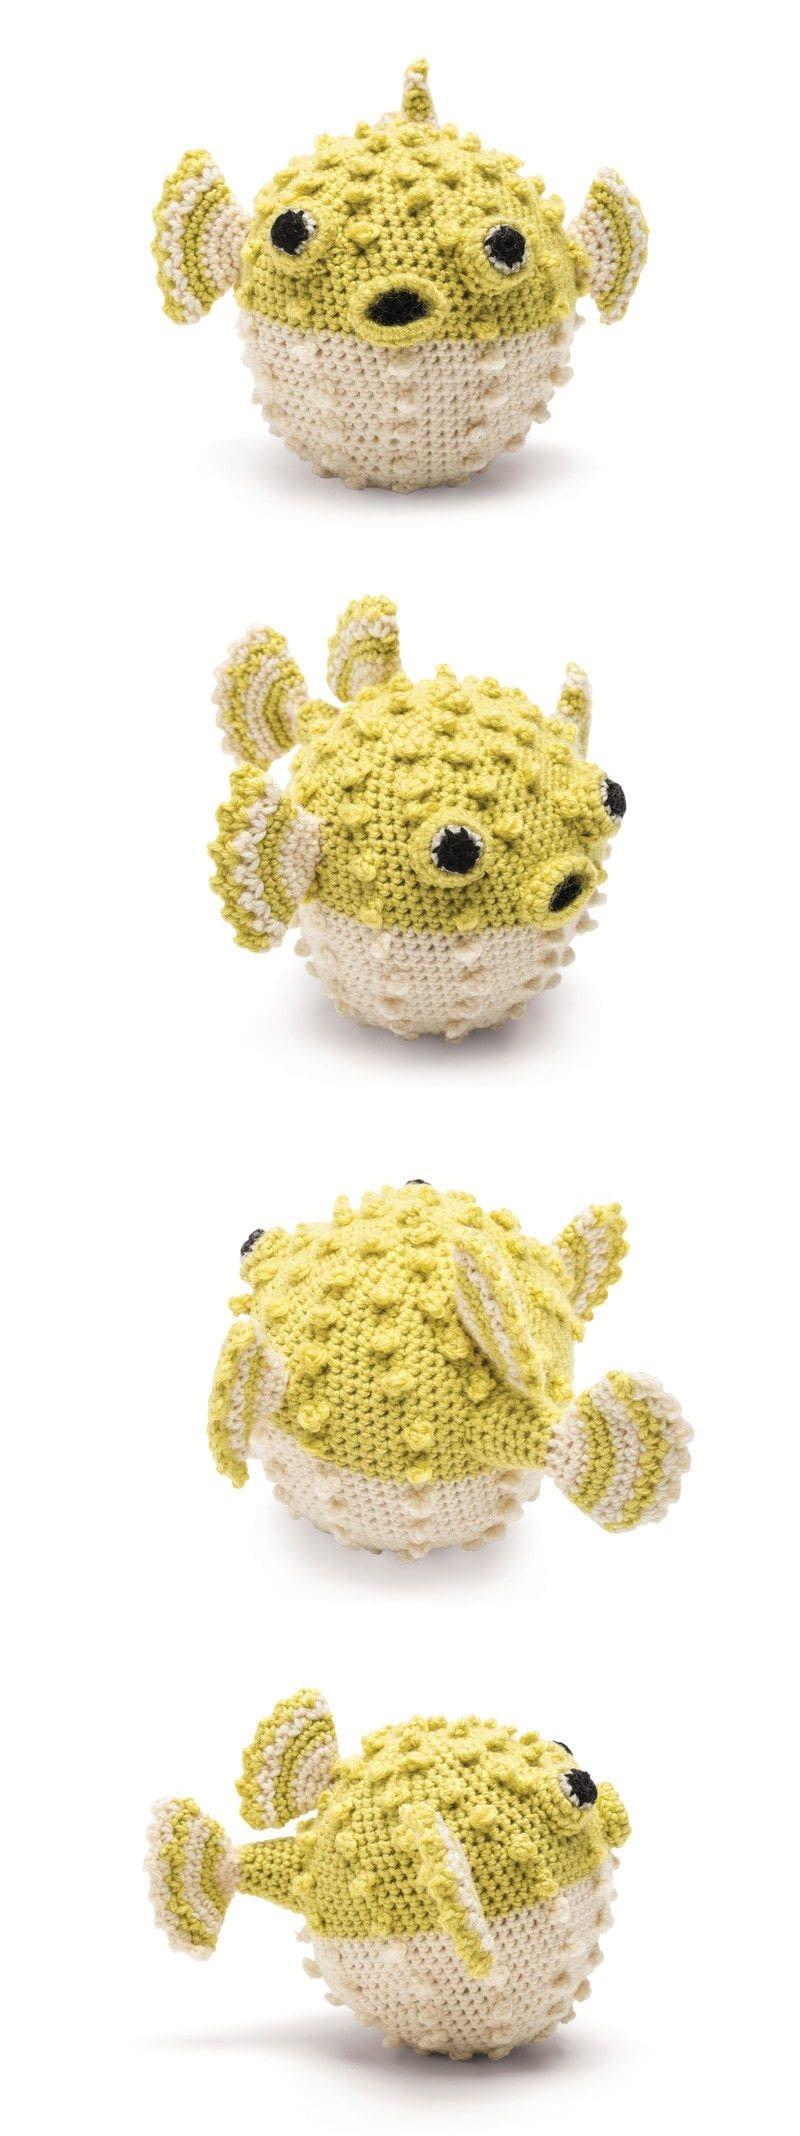 Puffer Fish | All Free Amigurumi | Crochet, Crochet patterns ...